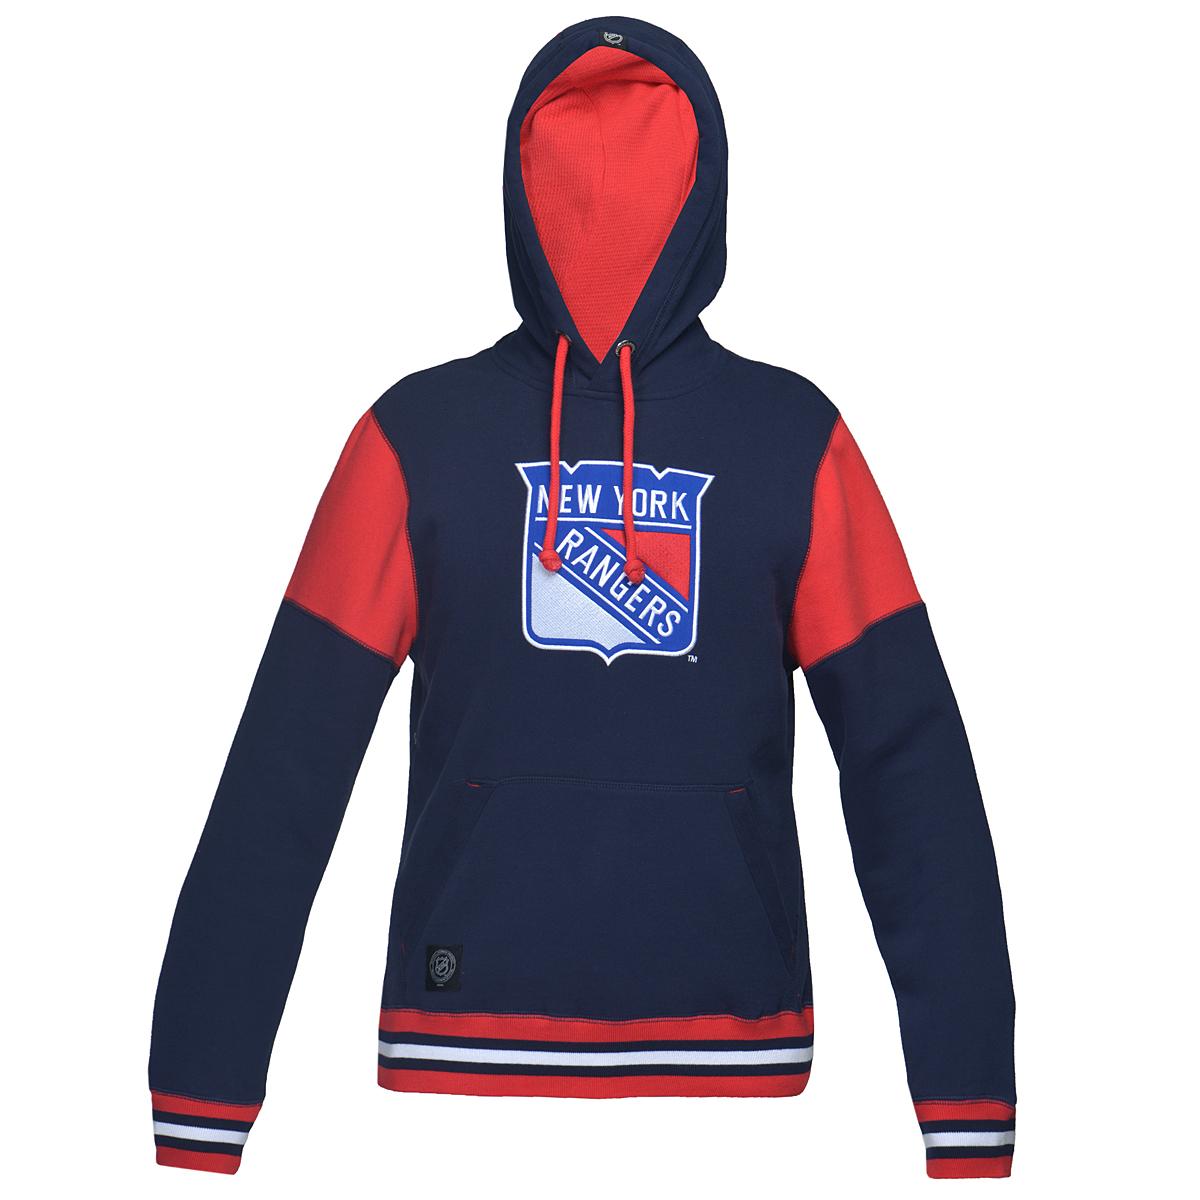 Толстовка мужская NHL New York Rangers, цвет: синий, красный. 35010. Размер XXL (54)